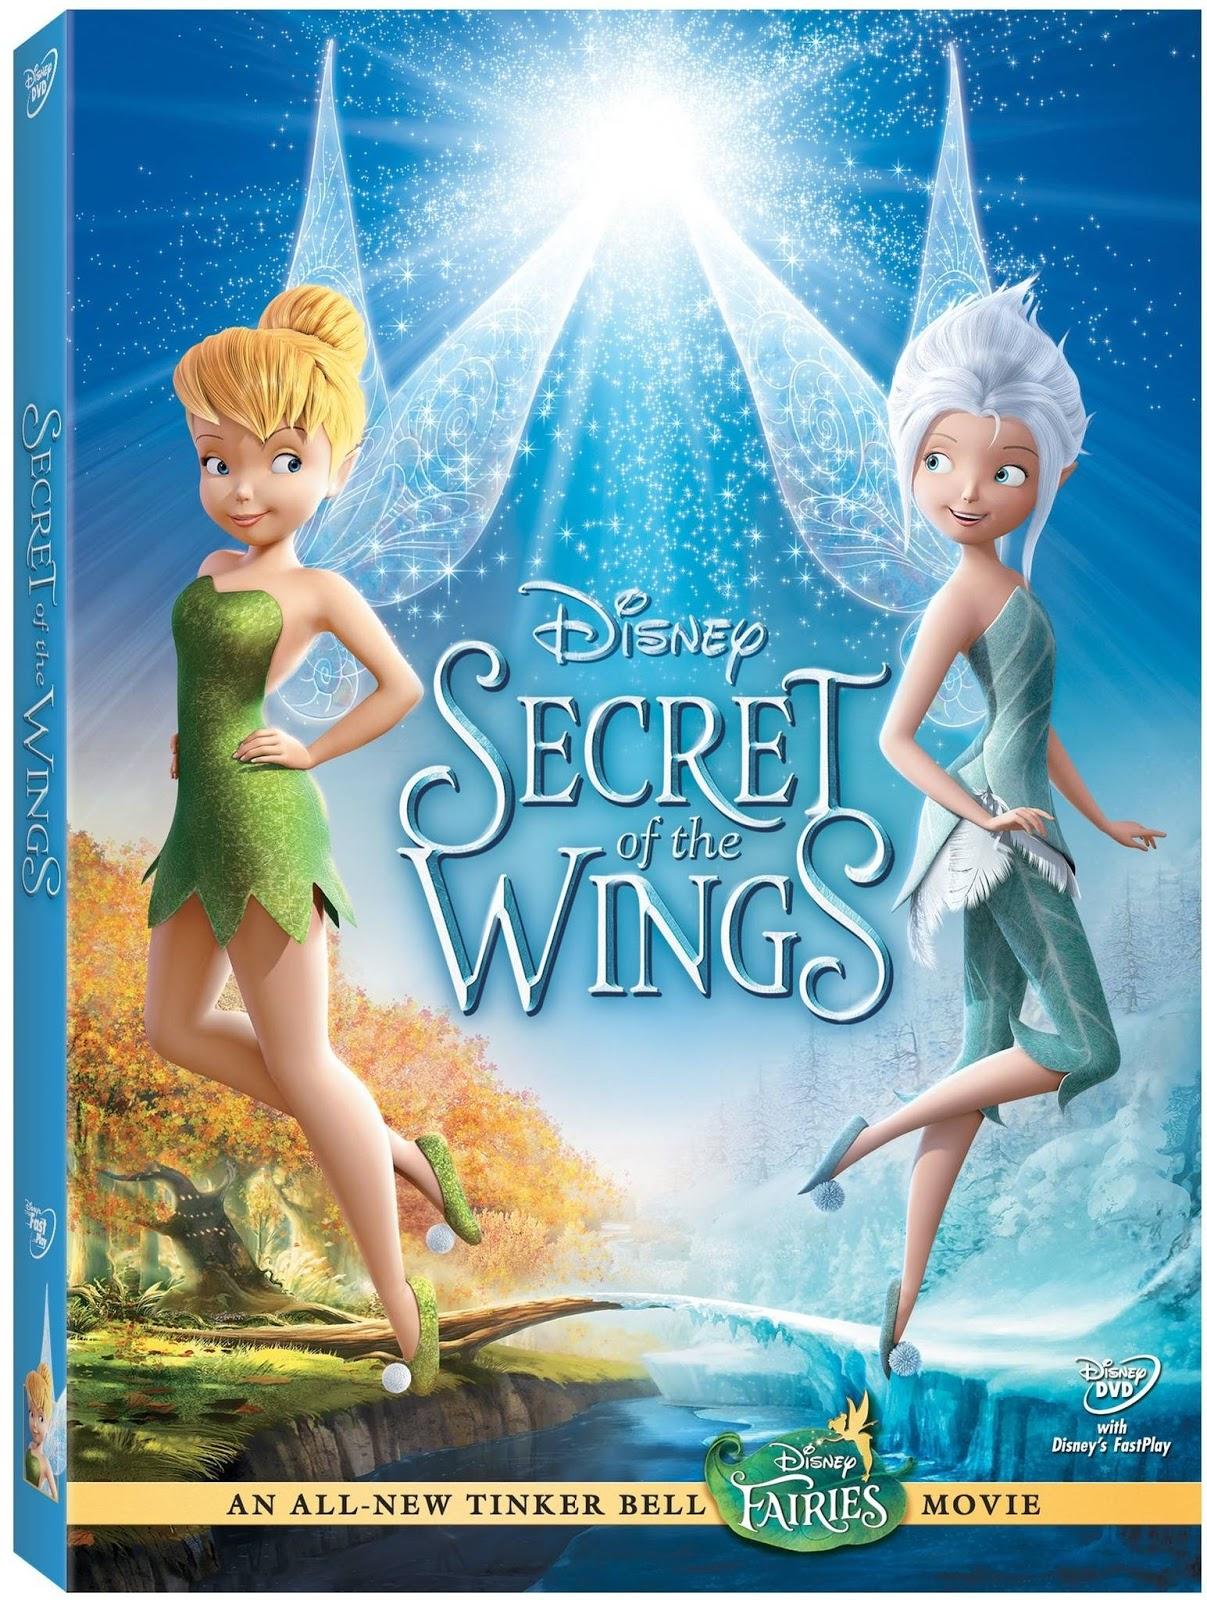 Tinkerbell secret of the wings hd wallpaper download.